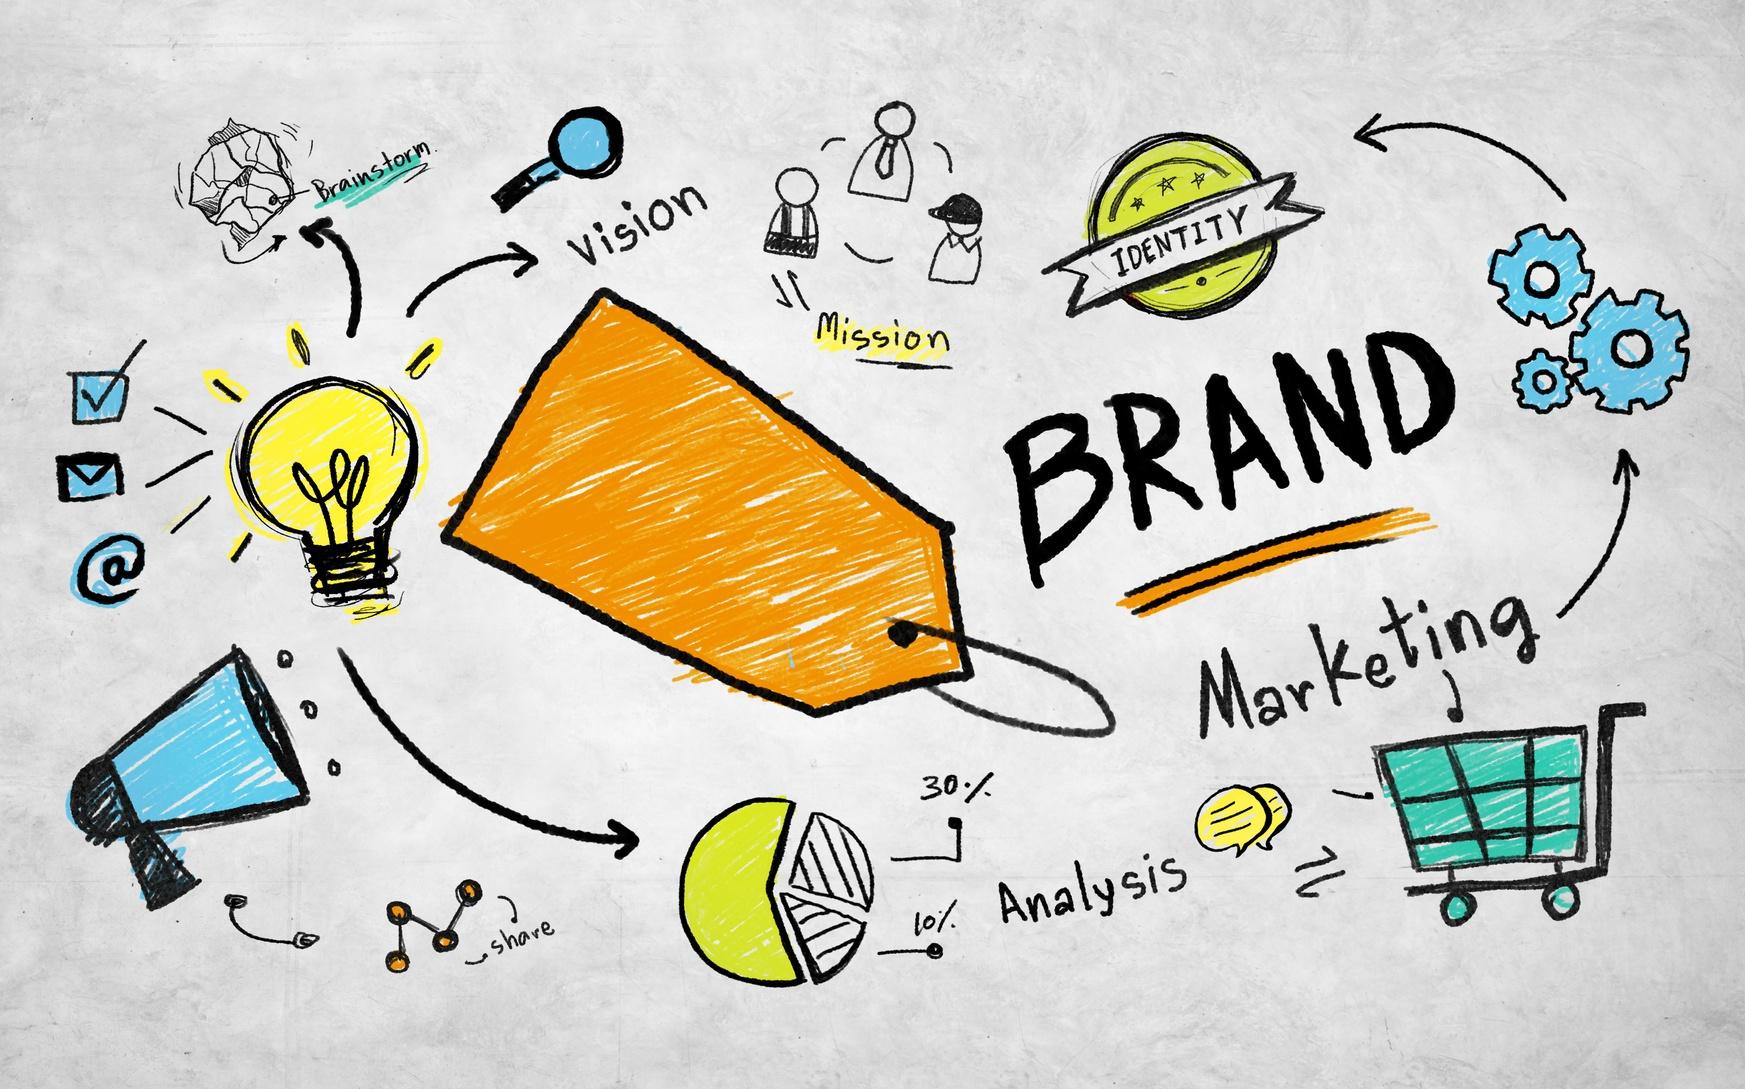 Brand strategy glossary